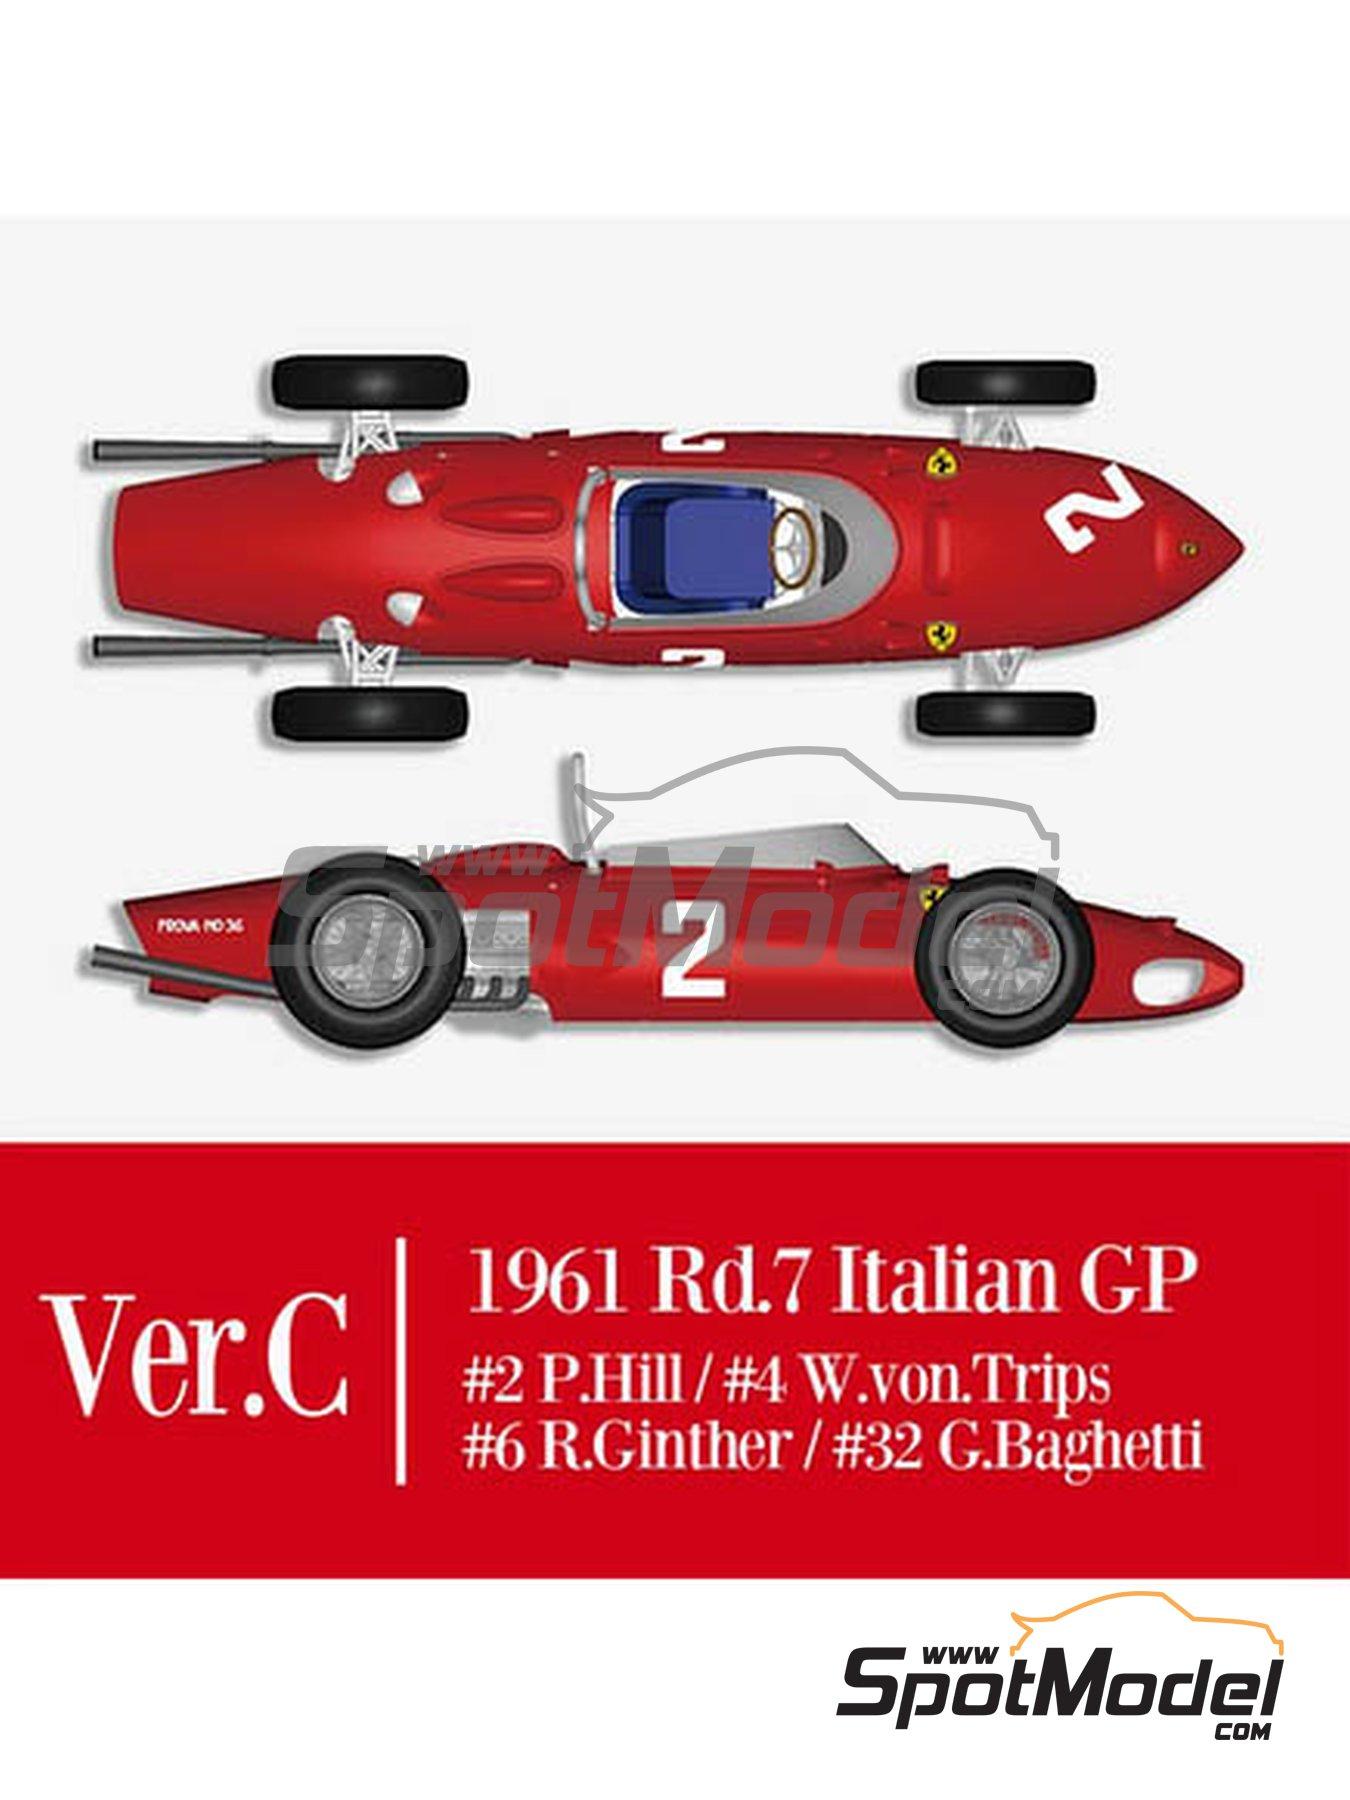 Ferrari 156 F1 Shark Nose - Gran Premio de Italia de Formula 1 1961 | Maqueta de coche en escala1/12 fabricado por Model Factory Hiro (ref.MFH-K644) image